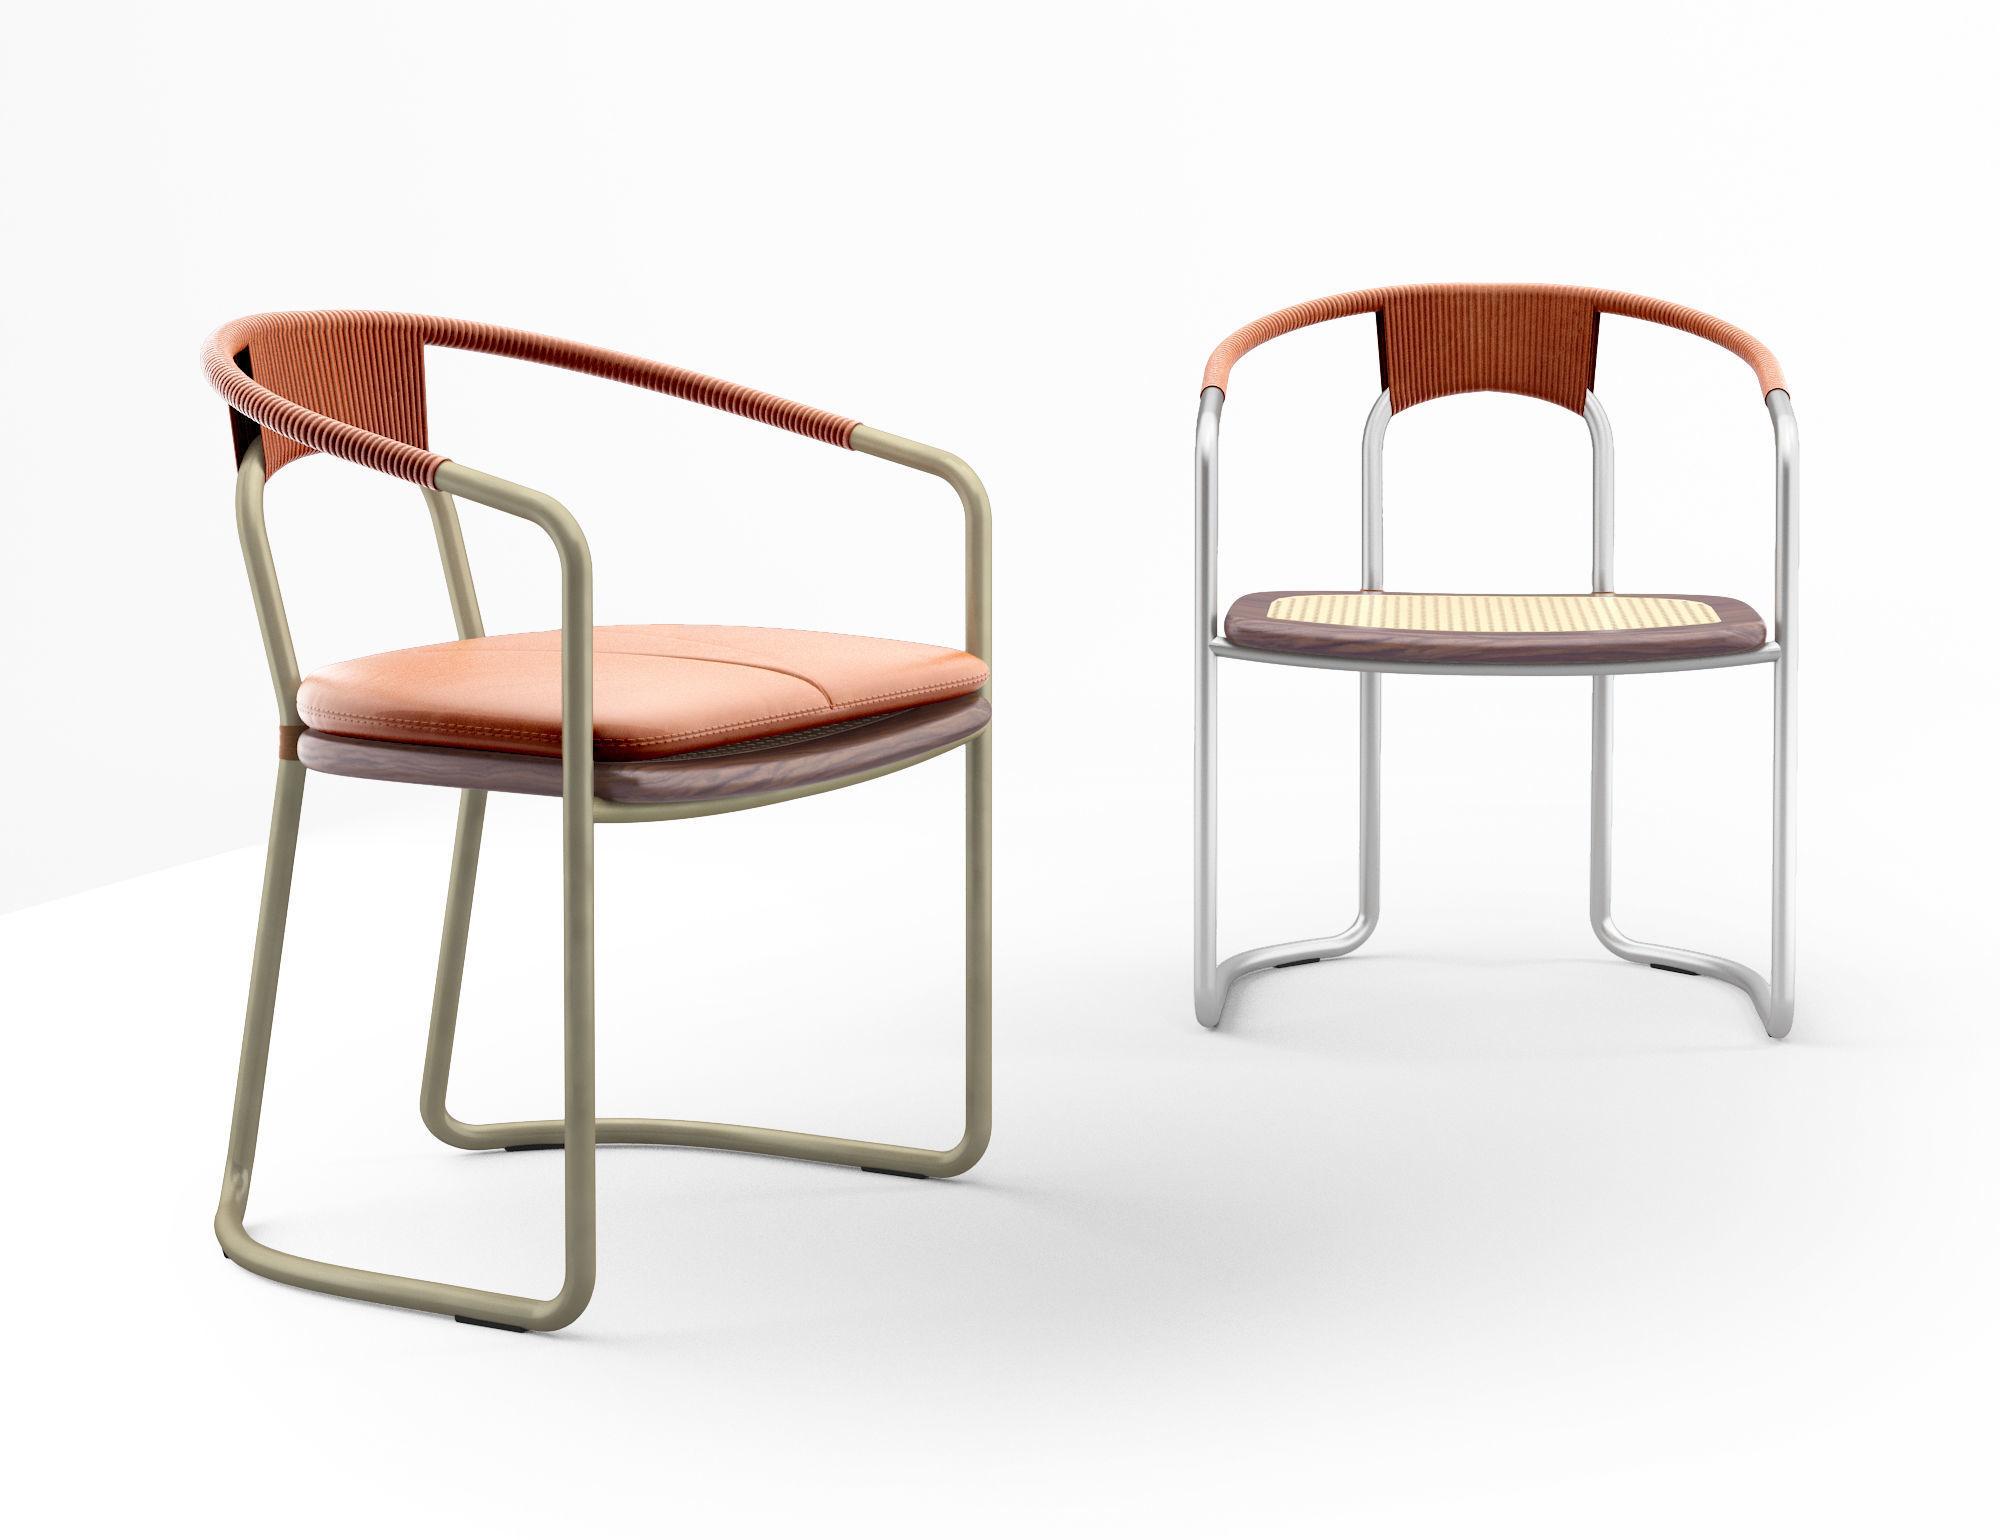 Bassam Fellows The Geometric Side Chair CB-450